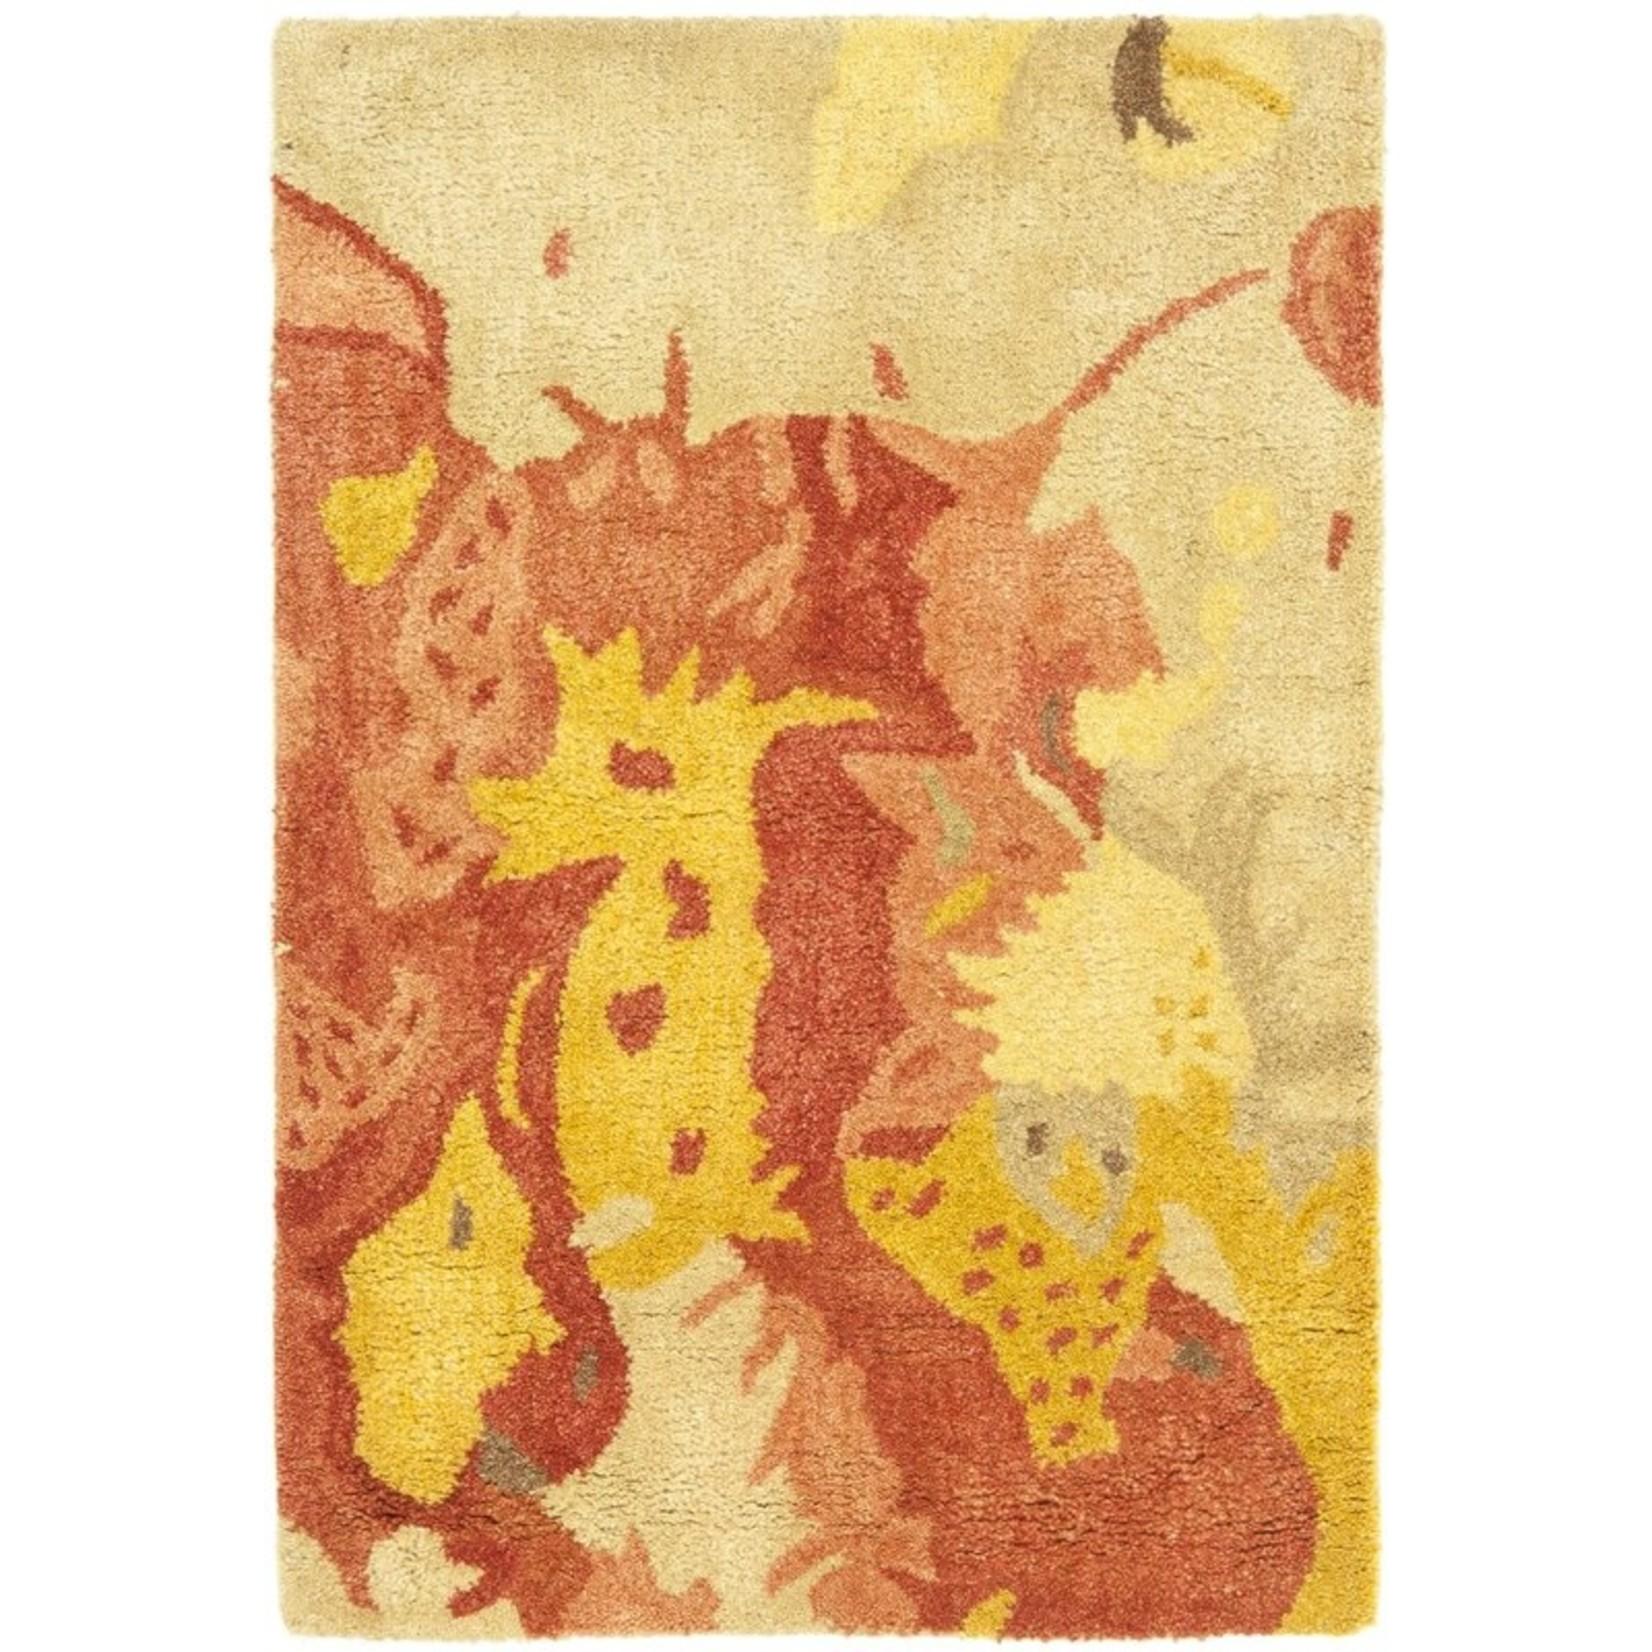 "*3'6"" x 5'6"" - Camren Abstract Handmade Tufted Wool Yellow/Orange Area Rug"